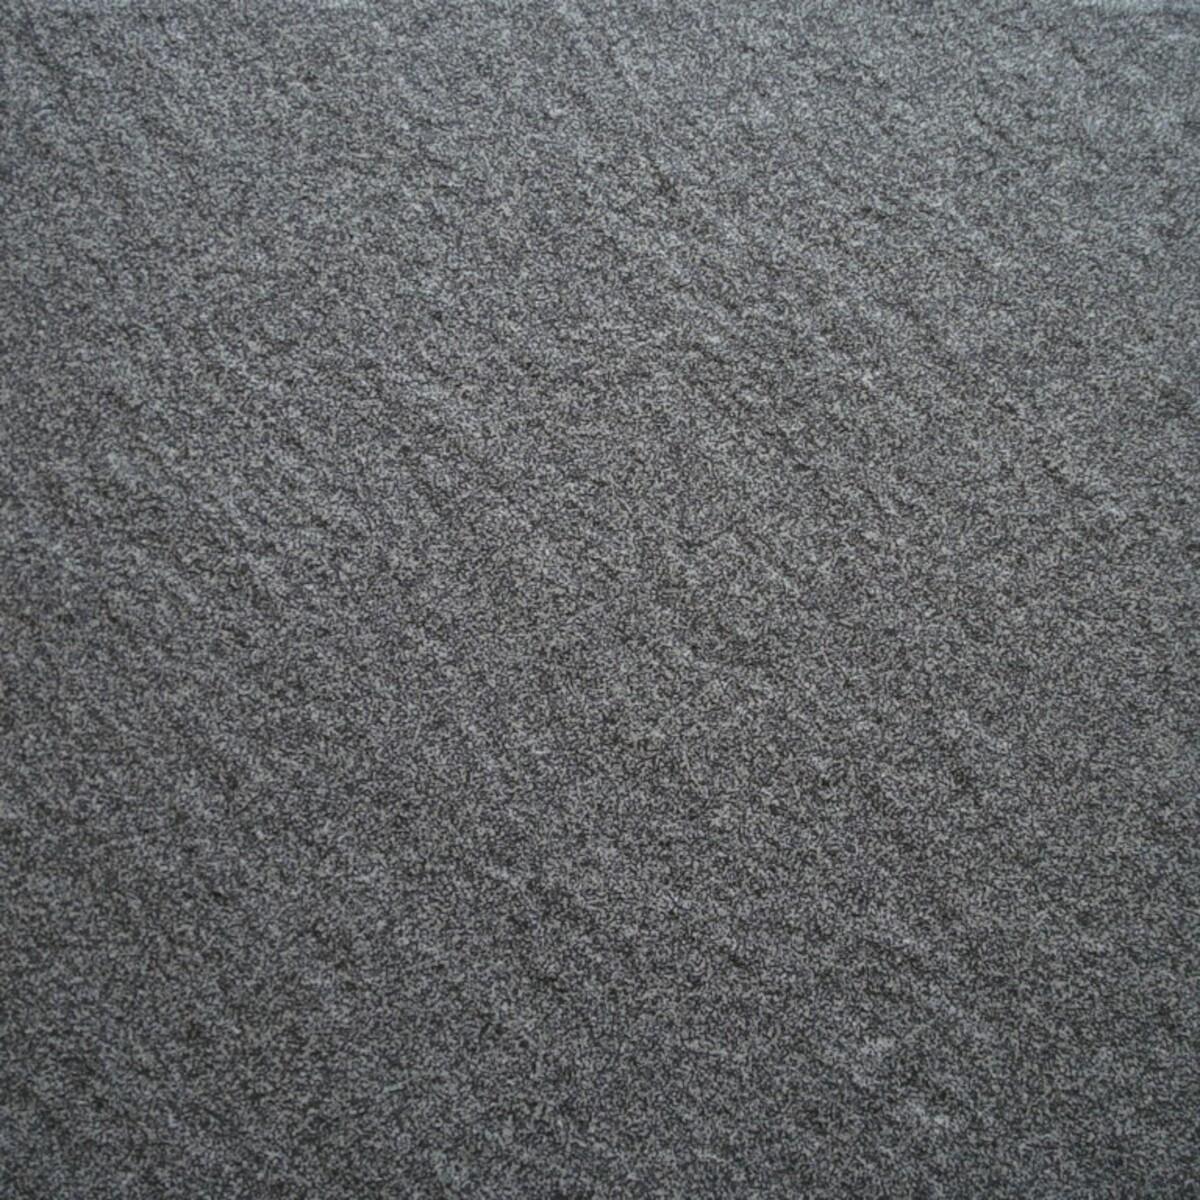 Dlažba Multi Kréta čierna 30x30 cm reliéfní TR735208.1